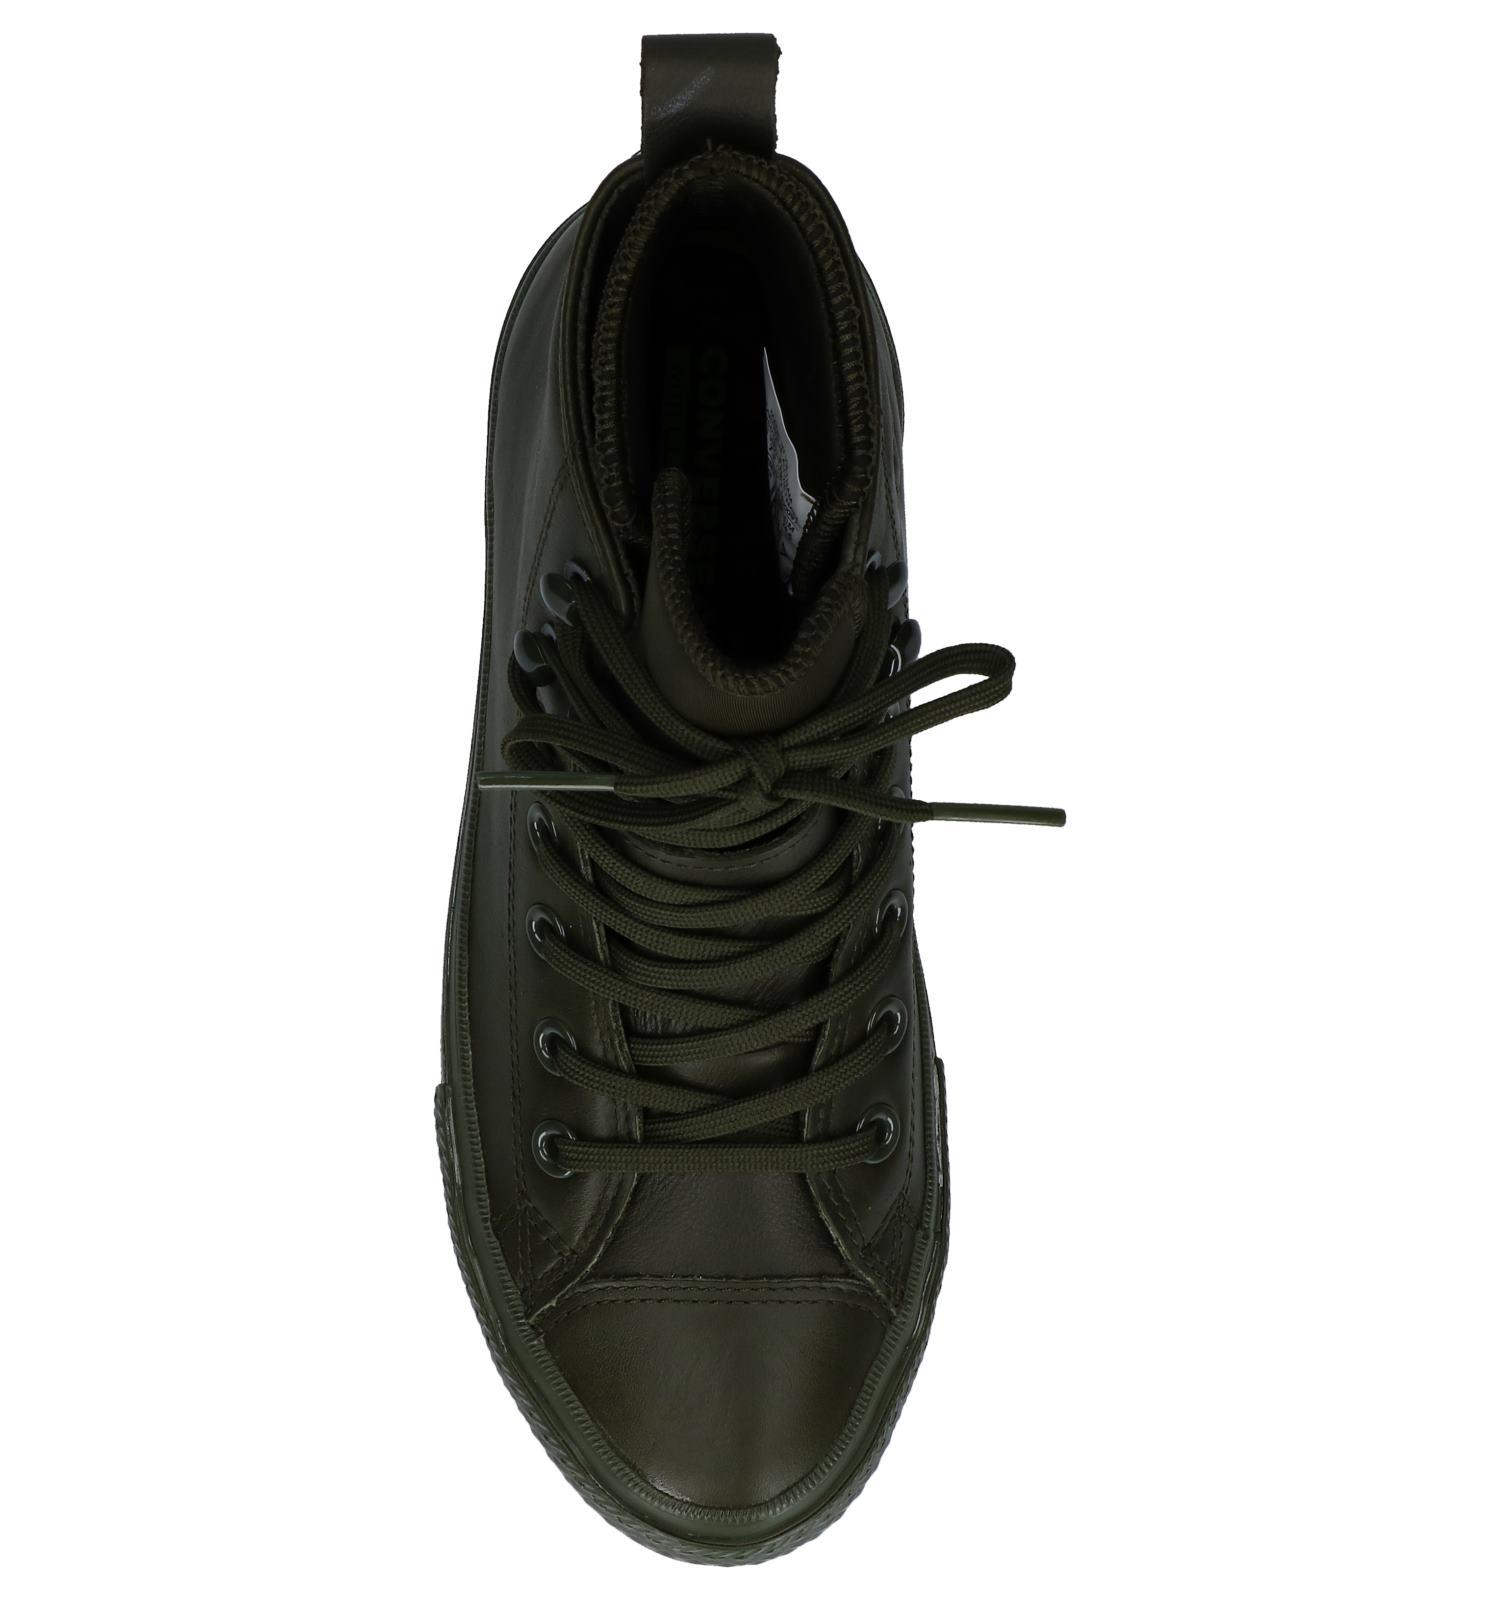 24b713dbbce Converse All Star WP Boot Olijfgroene Slip-on Sneakers   TORFS.BE   Gratis  verzend en retour